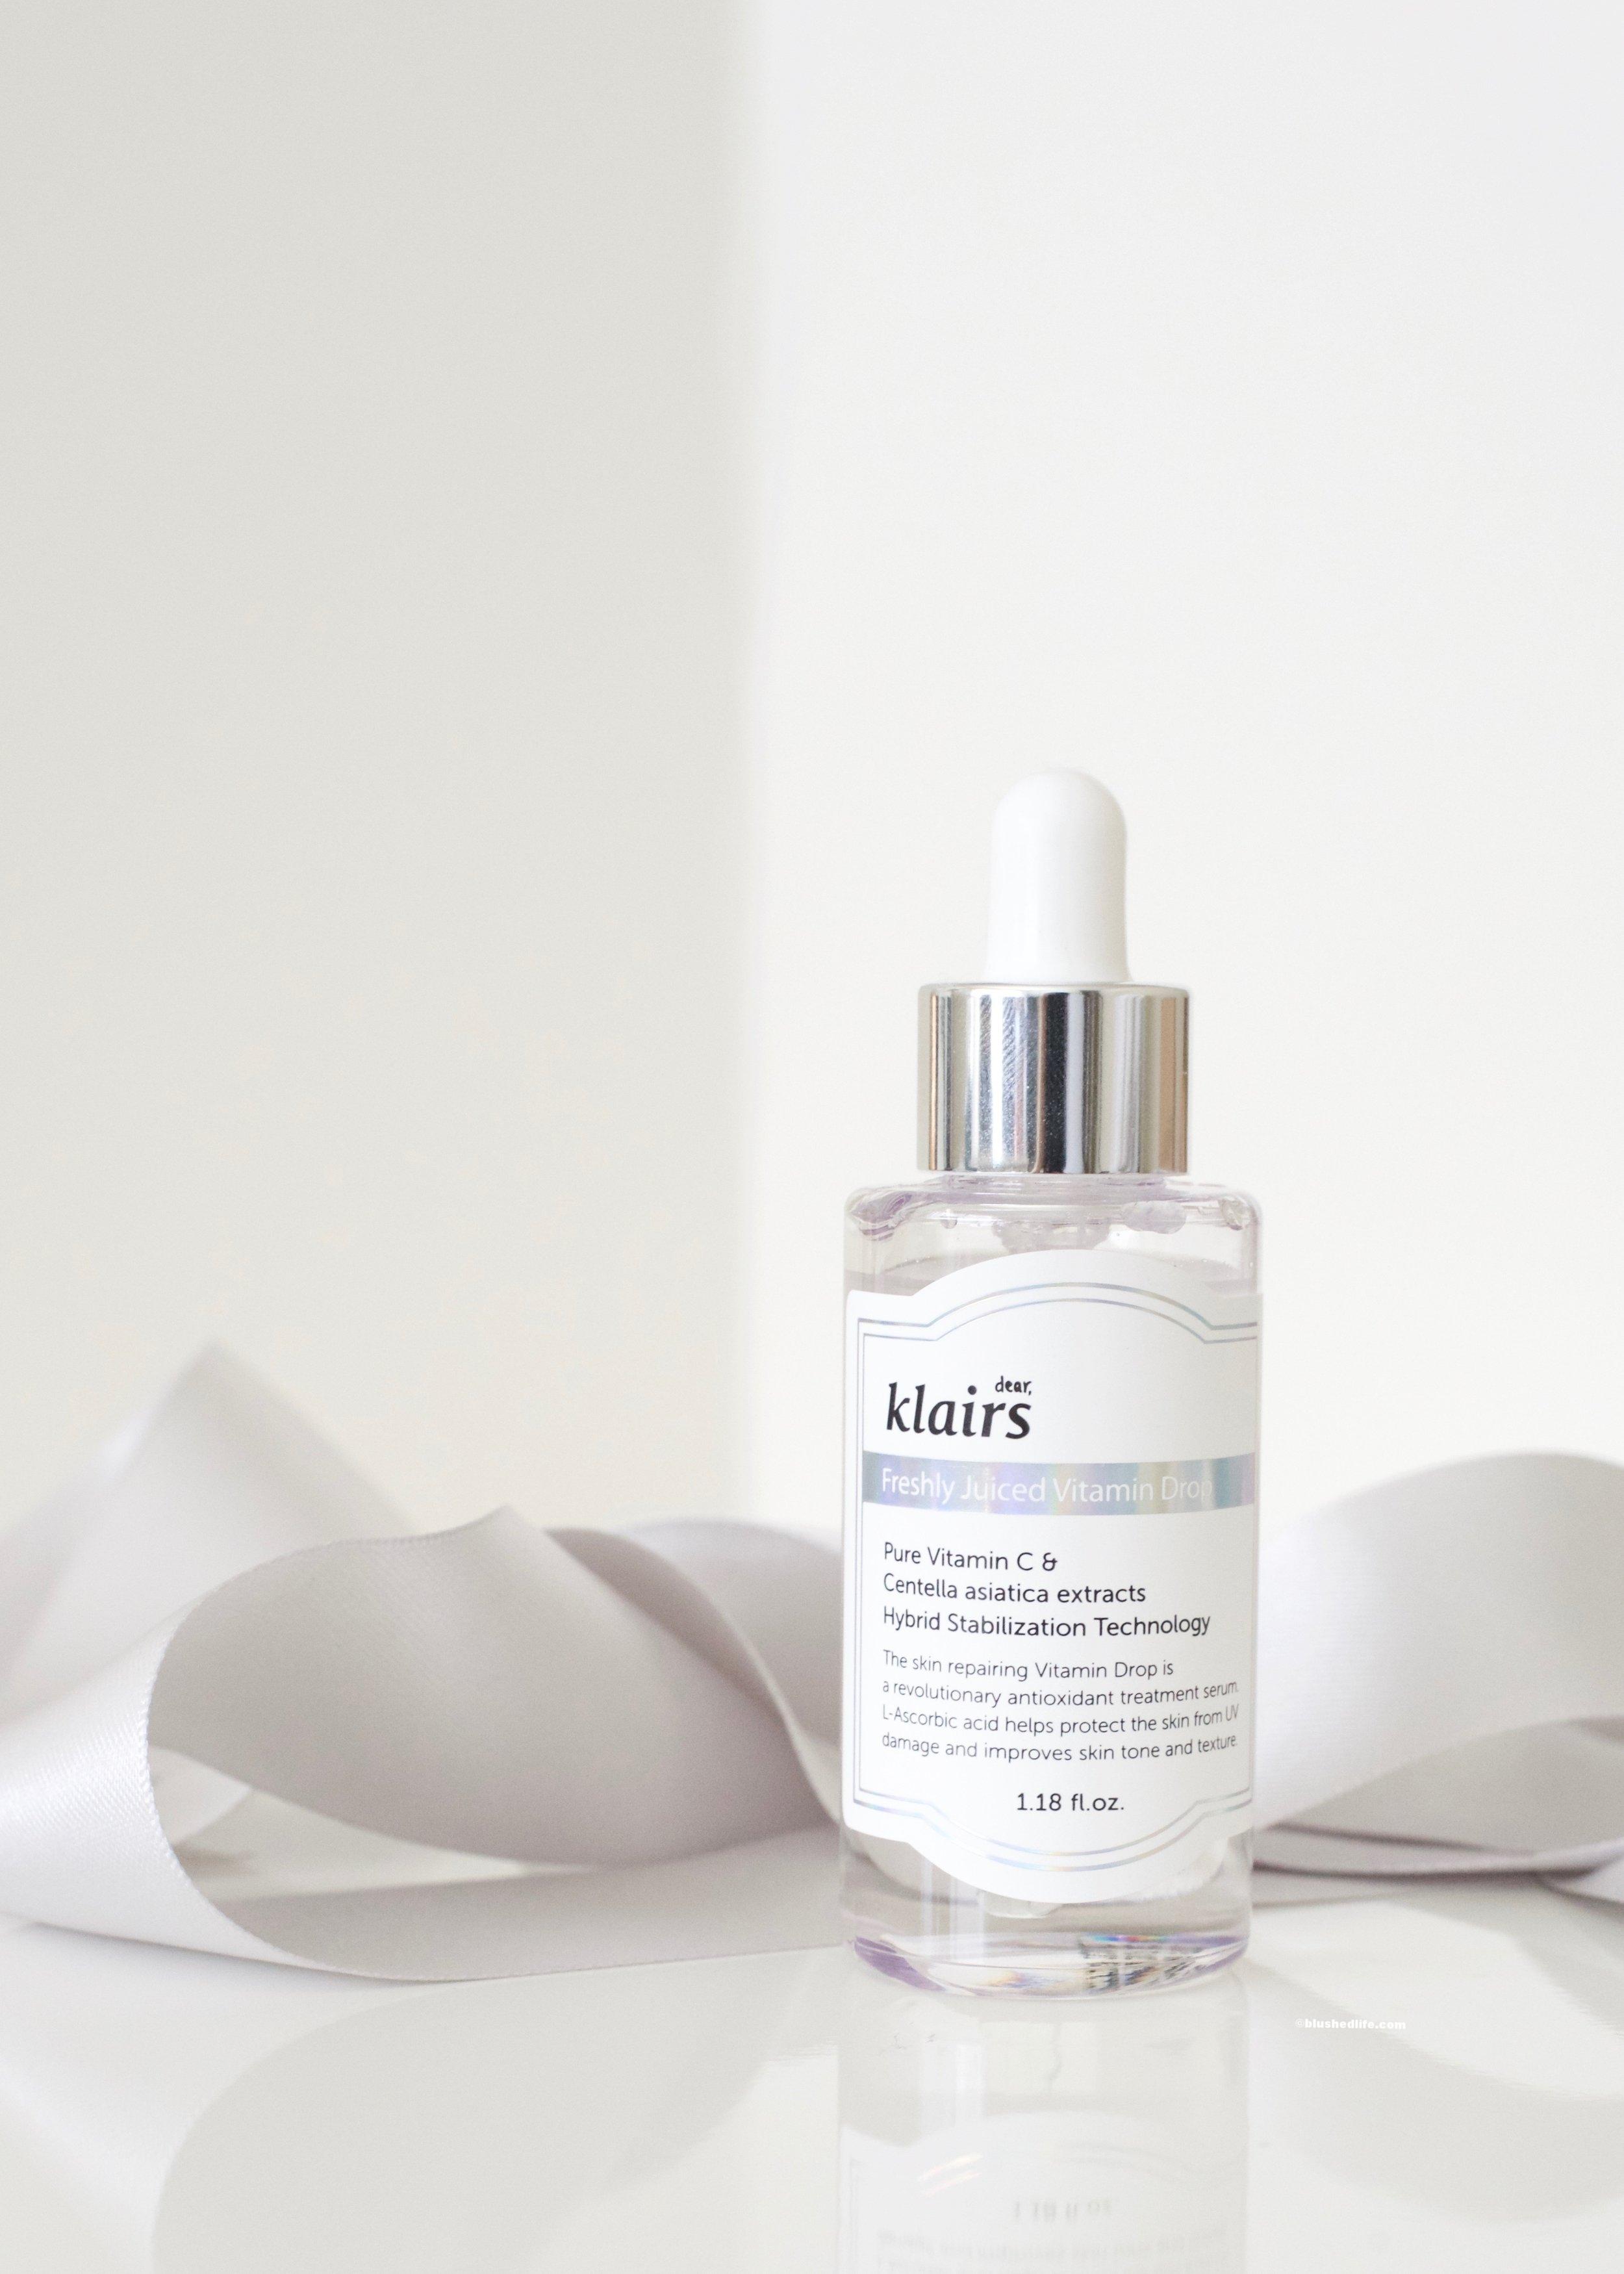 2. Klairs Vitamin C Drops - To brighten the skin and fade pigmentation.